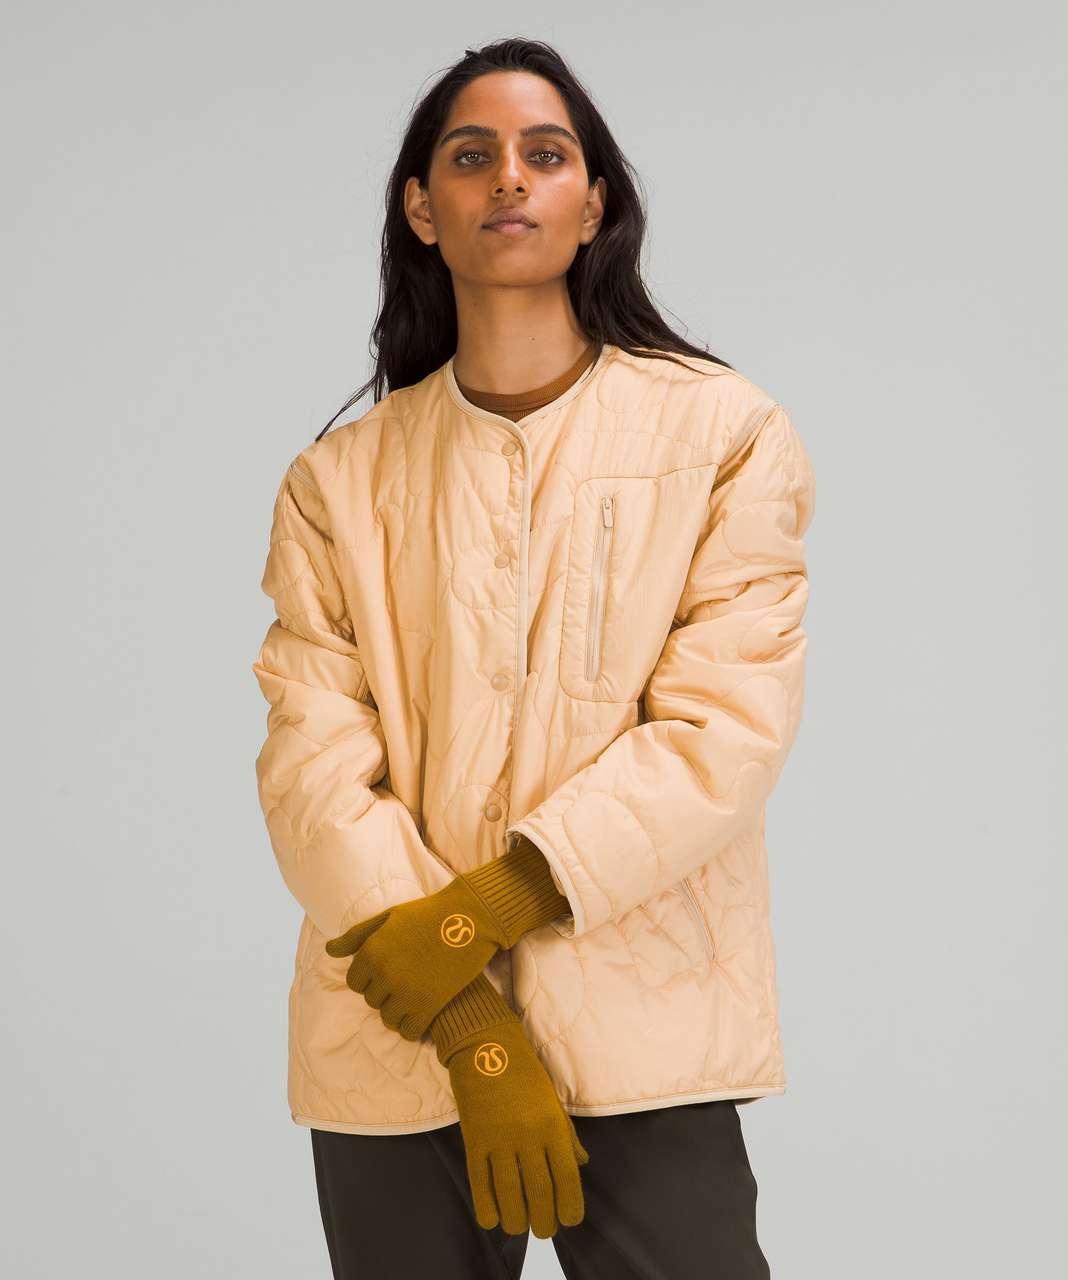 Lululemon Warm Revelation Gloves *Tech - Gold Spice